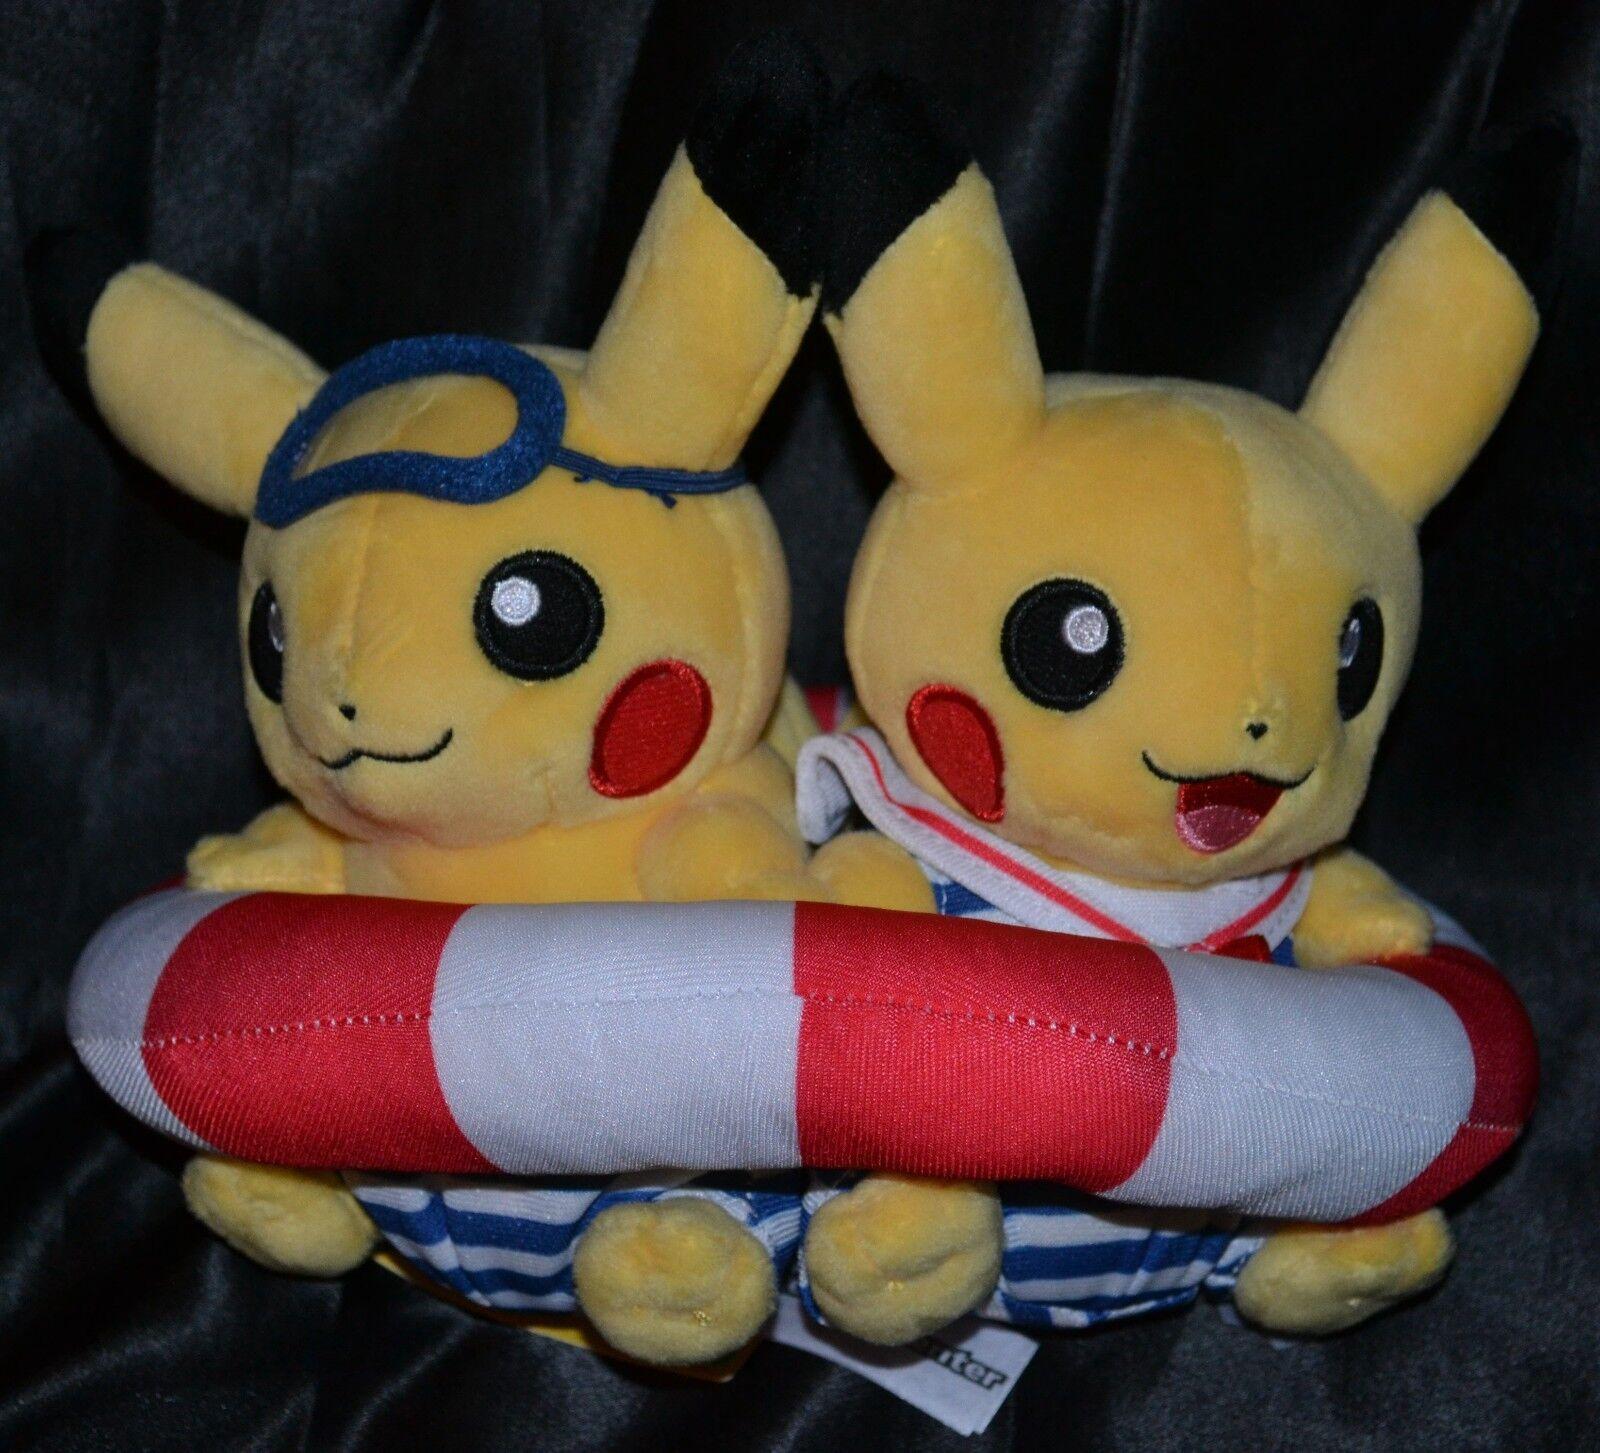 19.1cm Zusammen Pikachu Celebrations Matrose Marine Poké Plüsch Pokemon Center